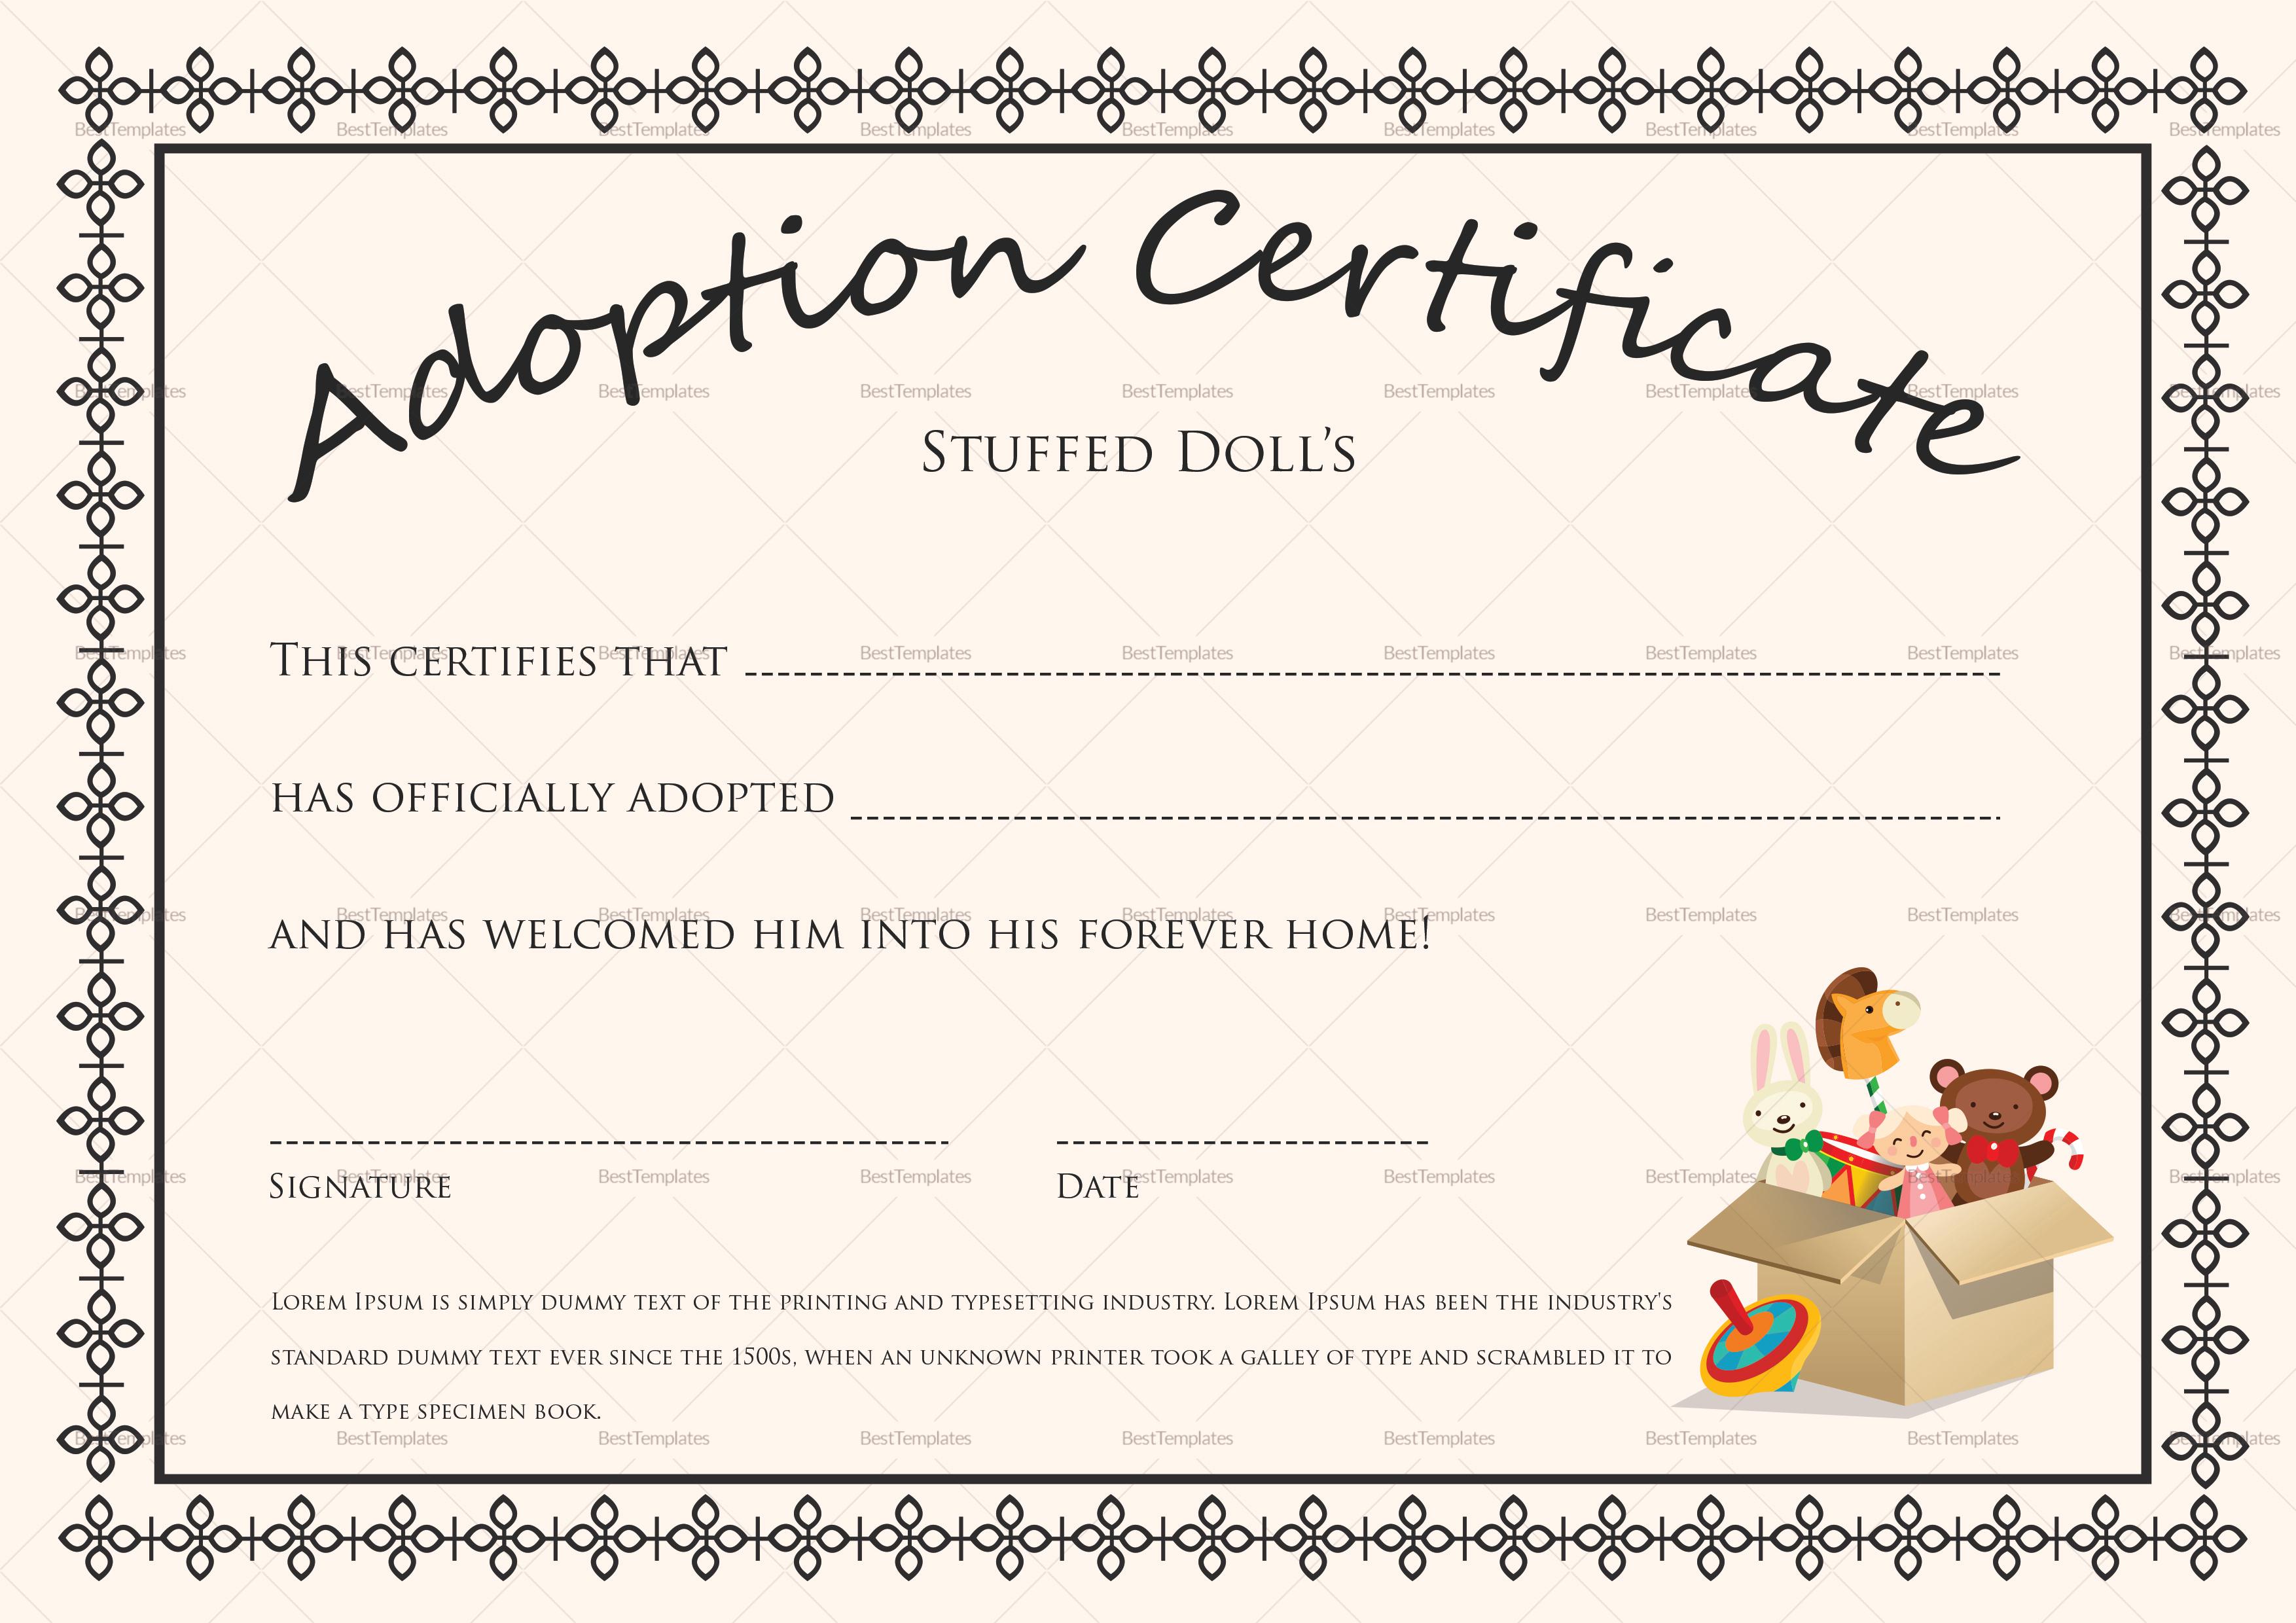 Adoption Certificate Template 40 Real Fake Templates Printable - Fake Adoption Certificate Free Printable